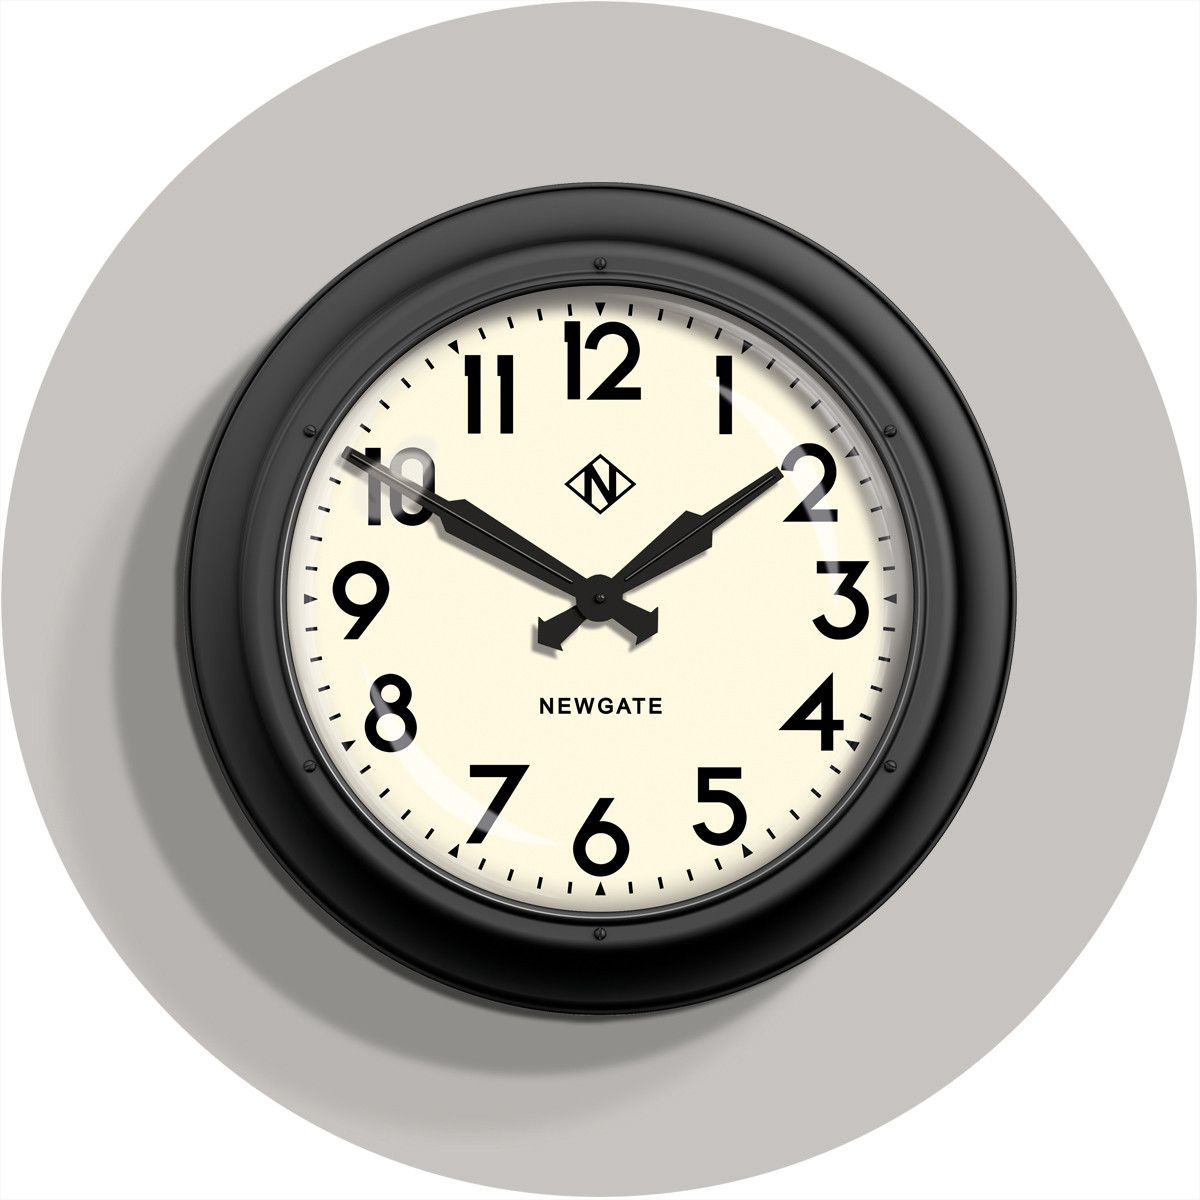 Giant Electric Oversized Black Station Wall Clock Newgate Clocks Homeware Wall Clock Clock Large Wall Clock